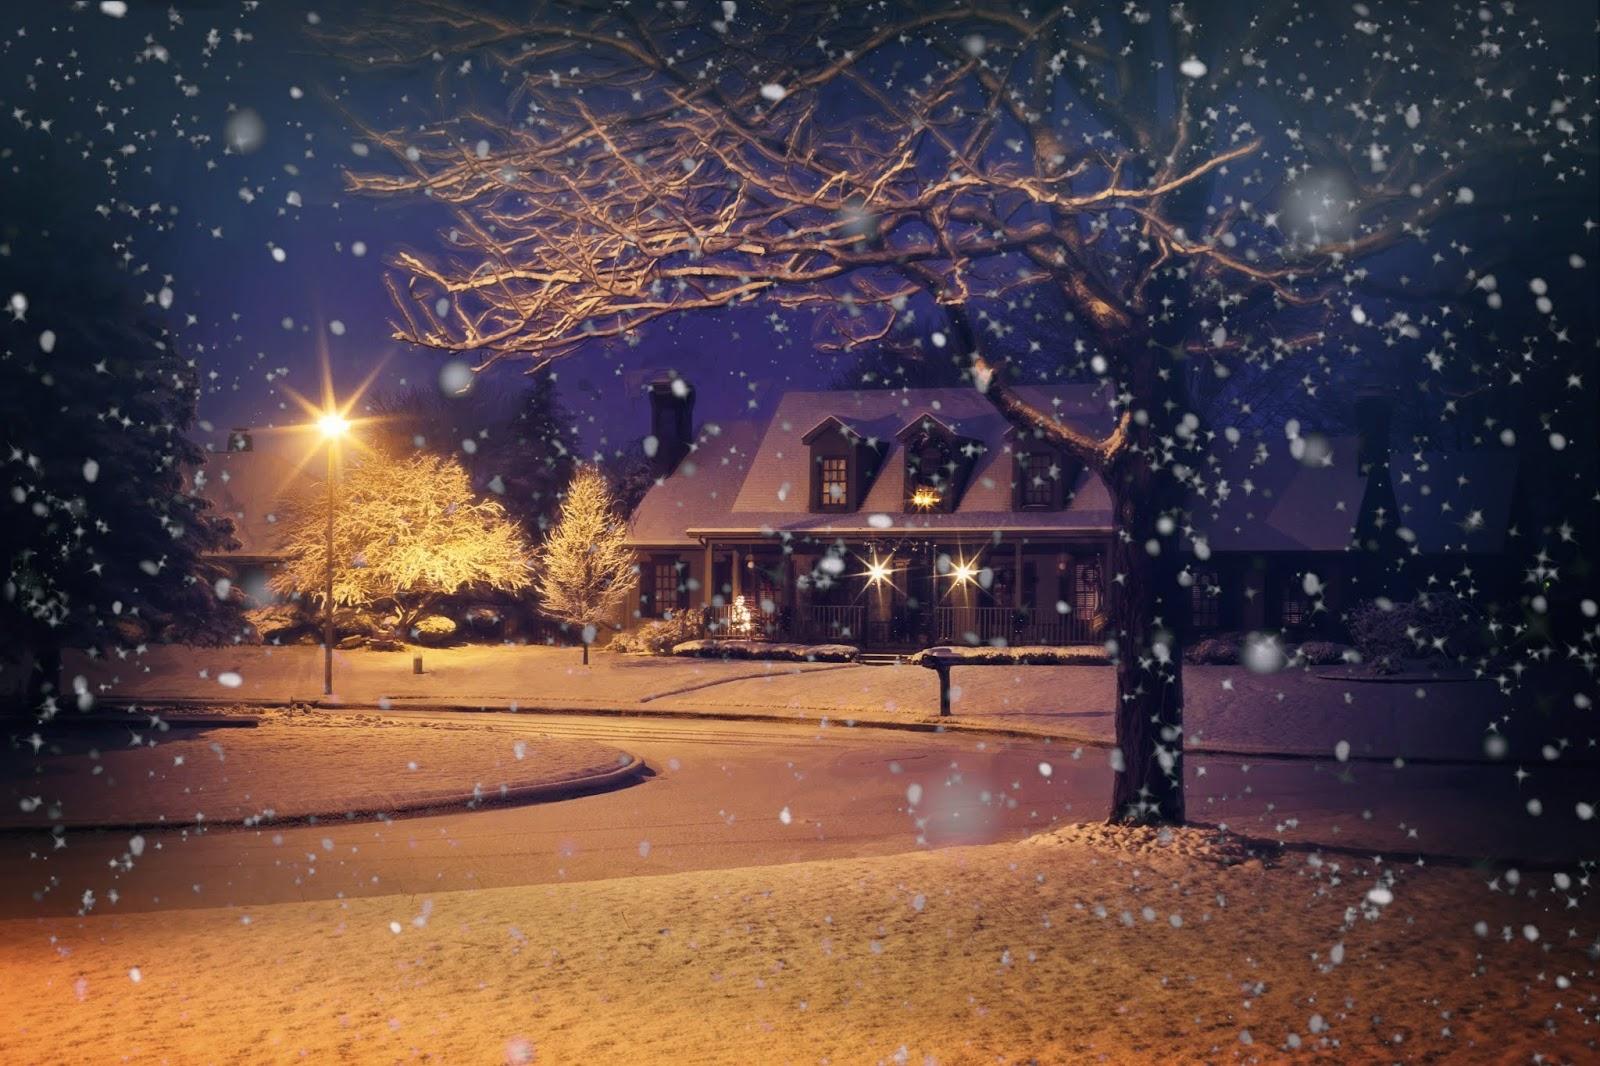 Ucapan Selamat Natal Terbaik dan Terbaru Tahun Ini